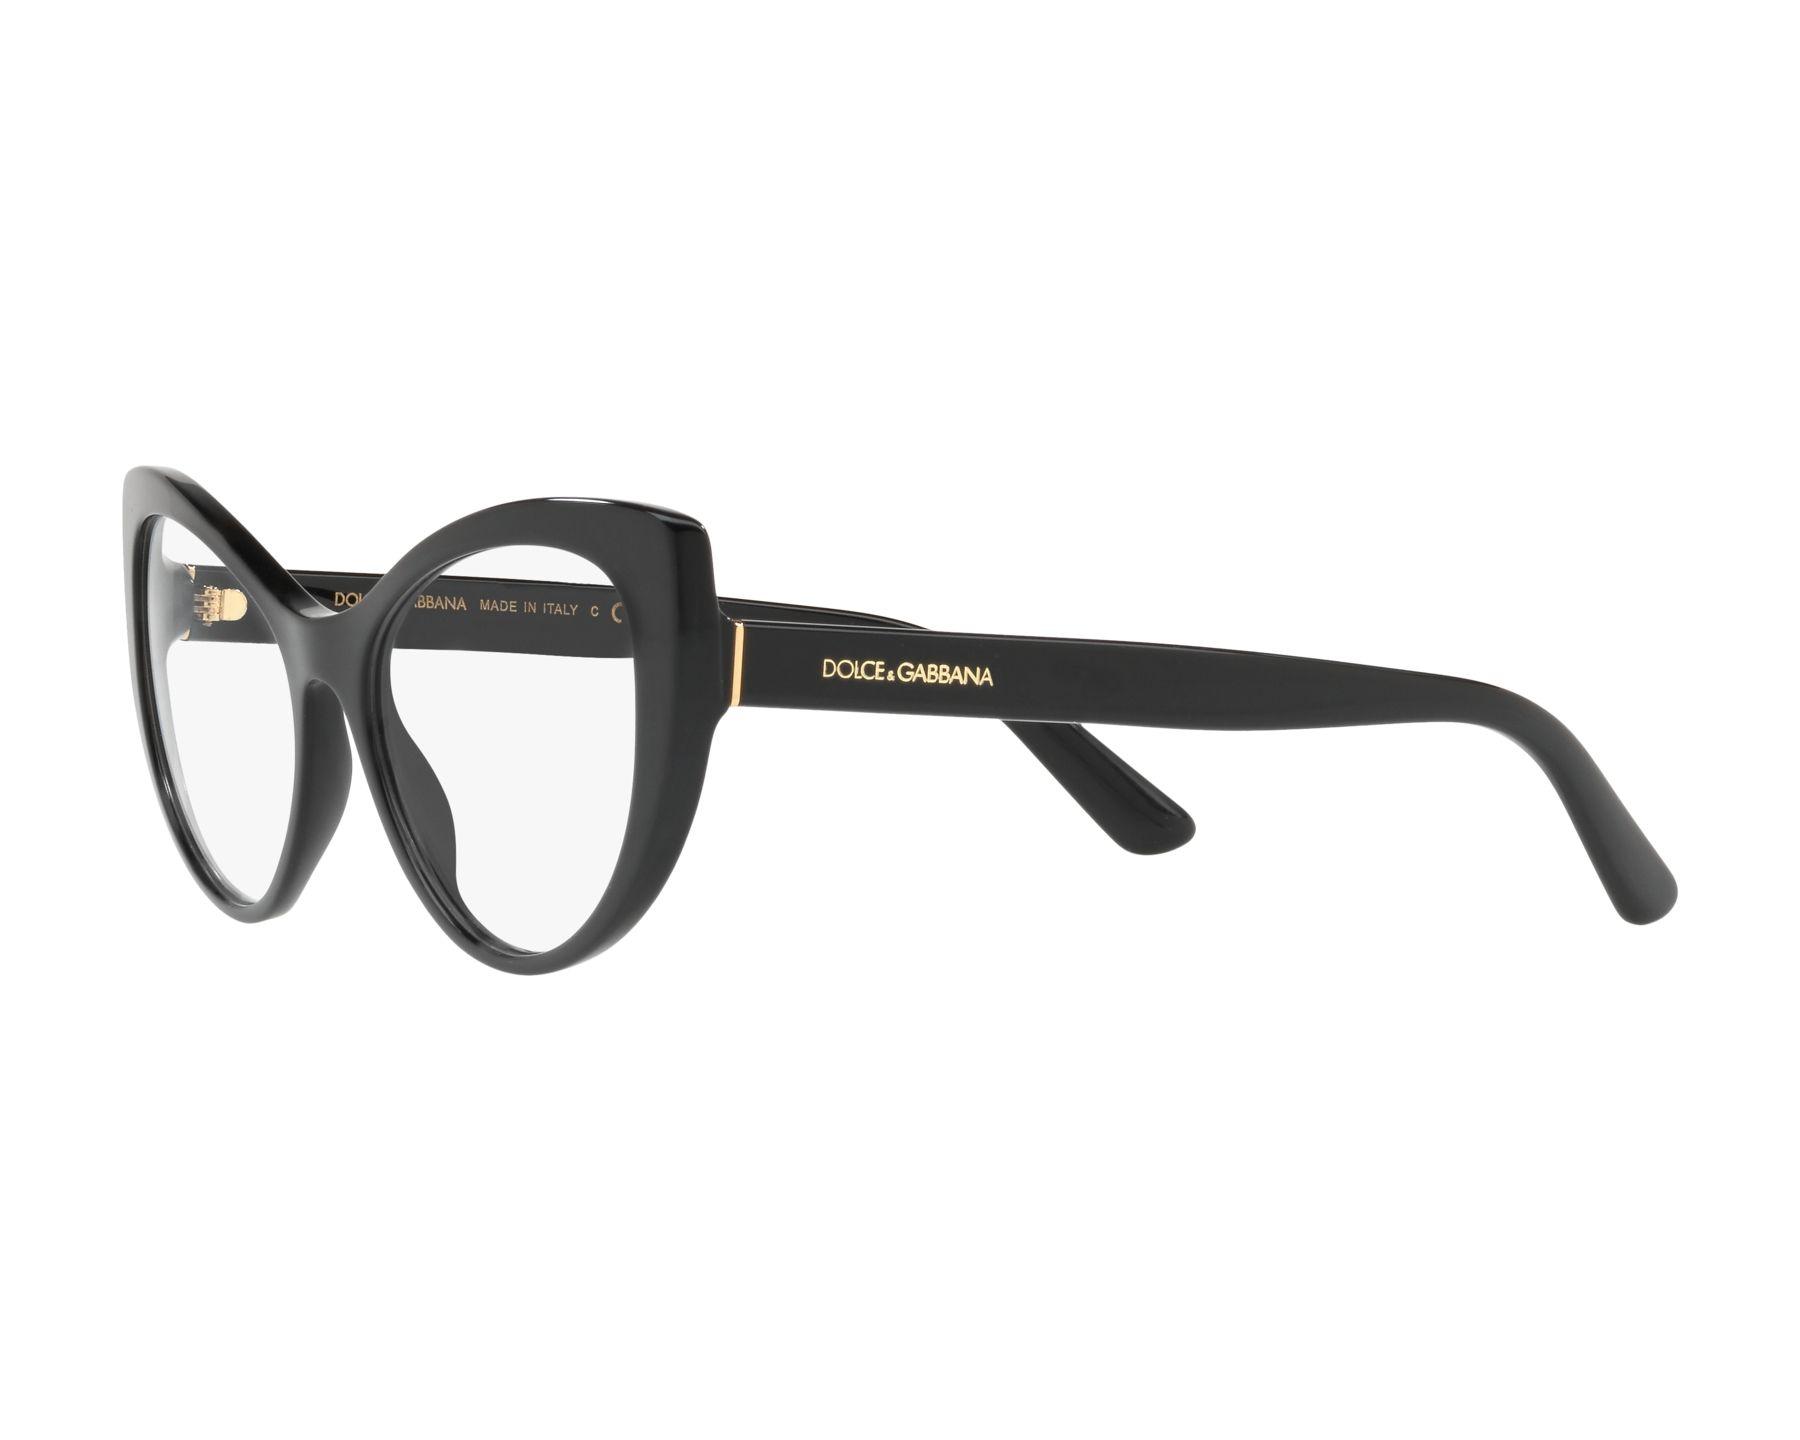 559b1eb6a957 eyeglasses Dolce   Gabbana DG-3285 501 52-17 Black 360 degree view 3